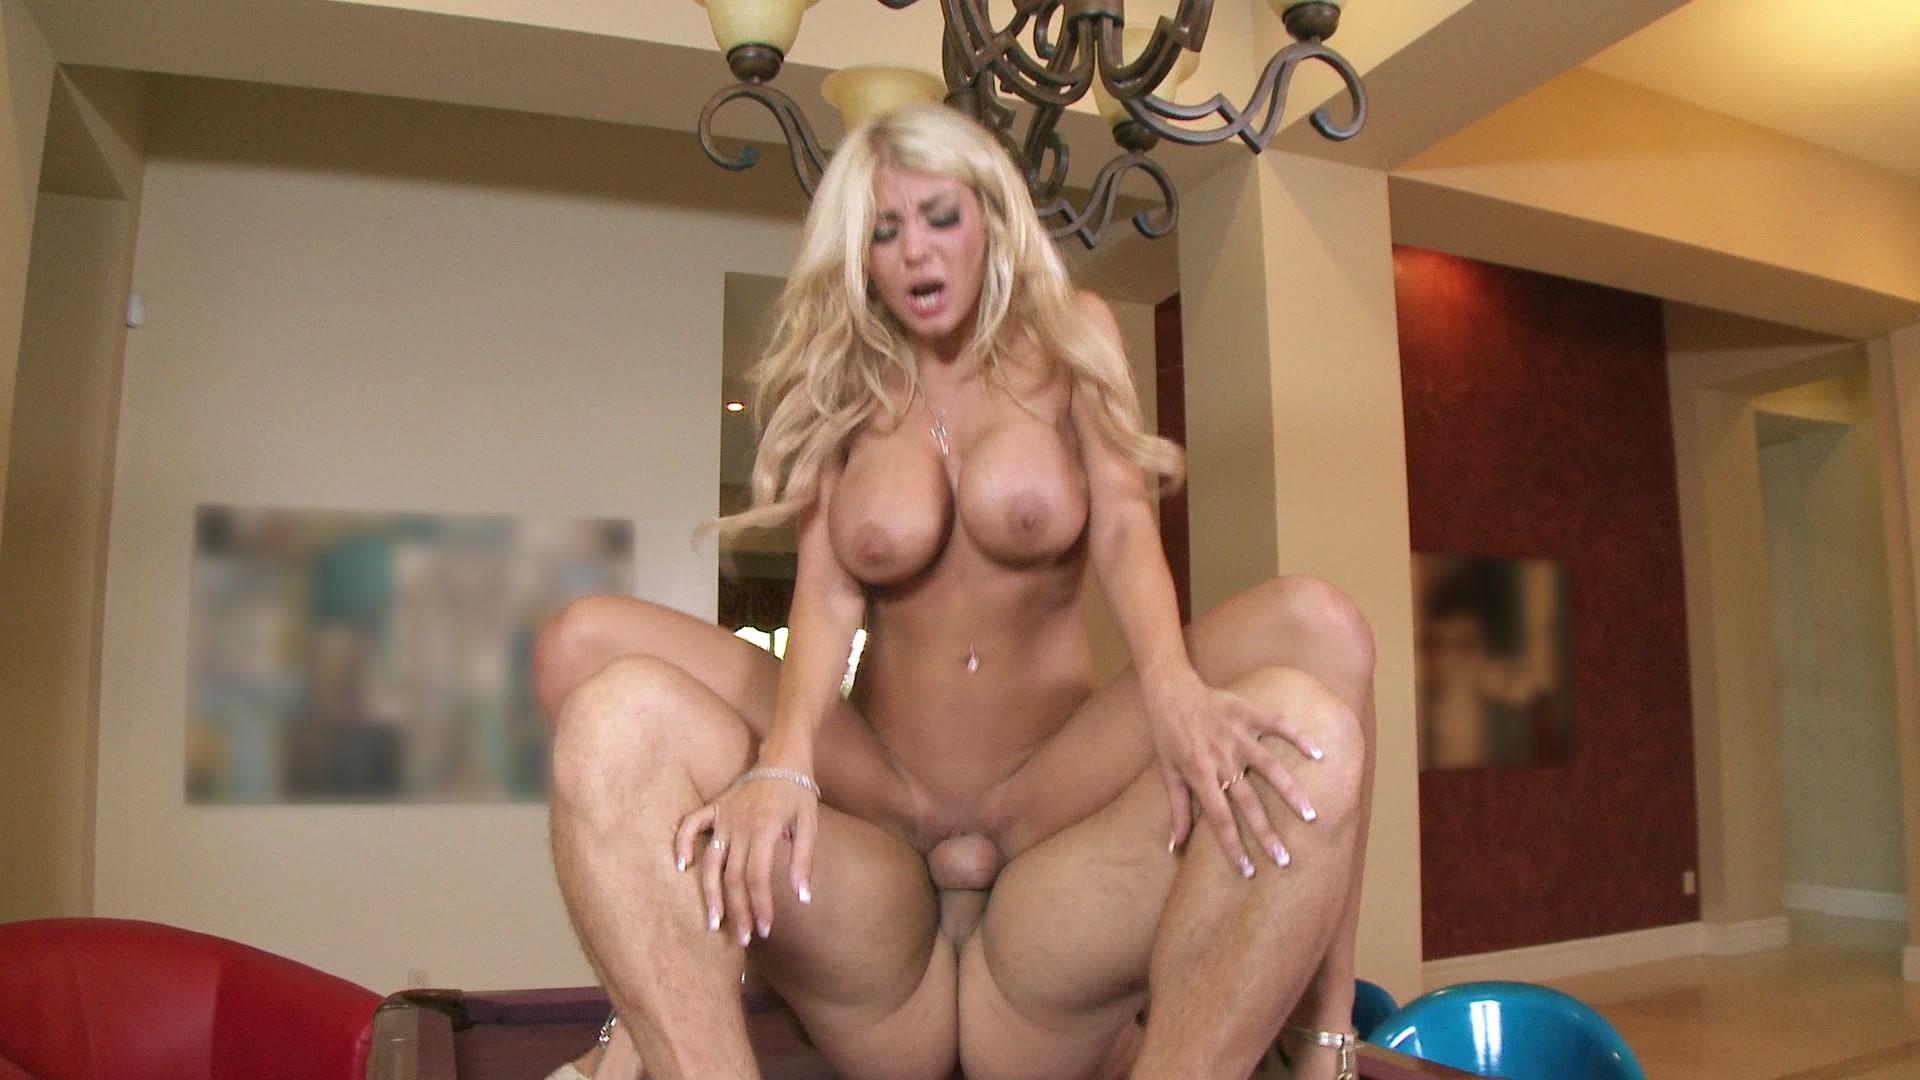 Смотреть онлайн порно бразерс hd 720, Brazzers - Порно видео смотреть онлайн бесплатно от 16 фотография